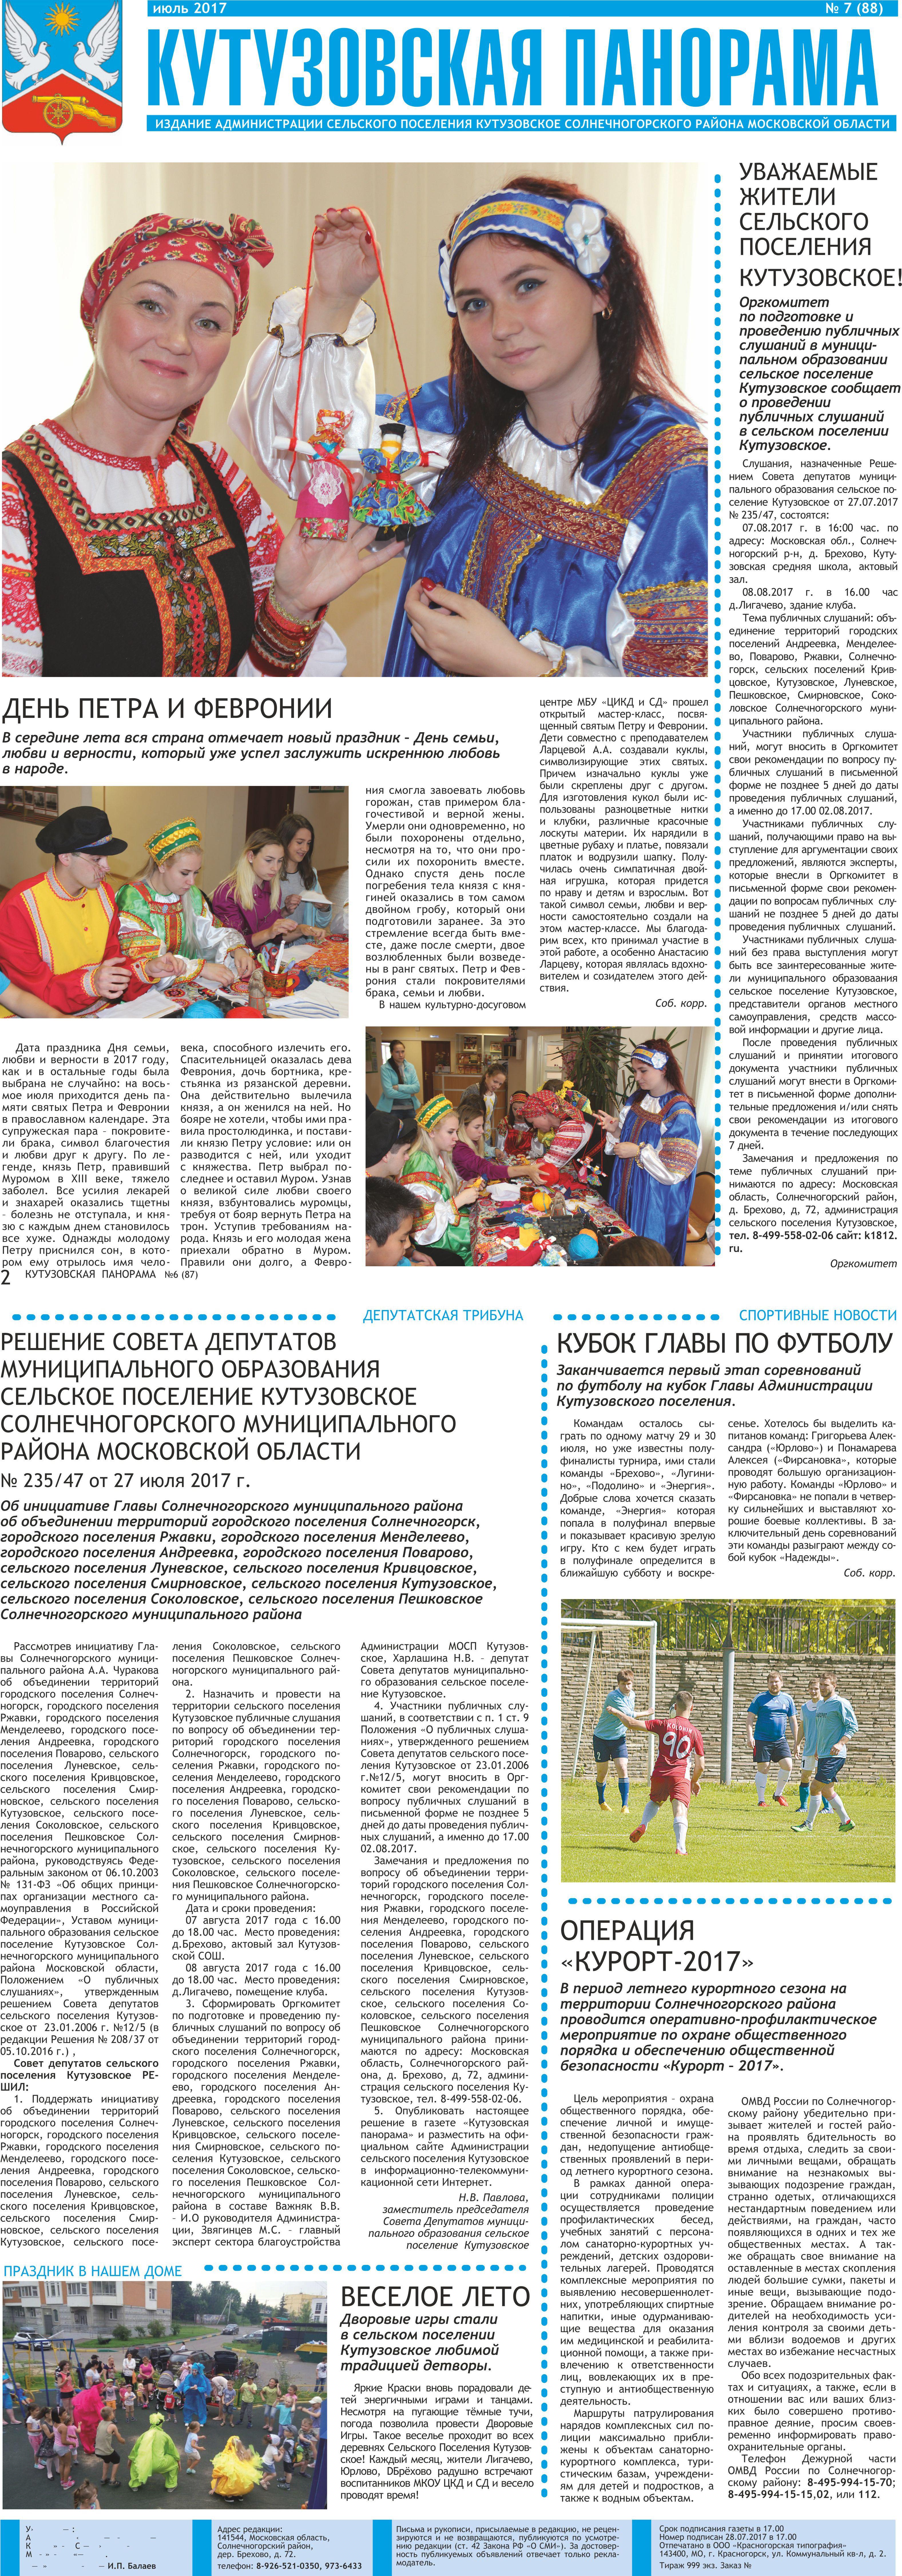 Кутузовская-панорама-июль_2017